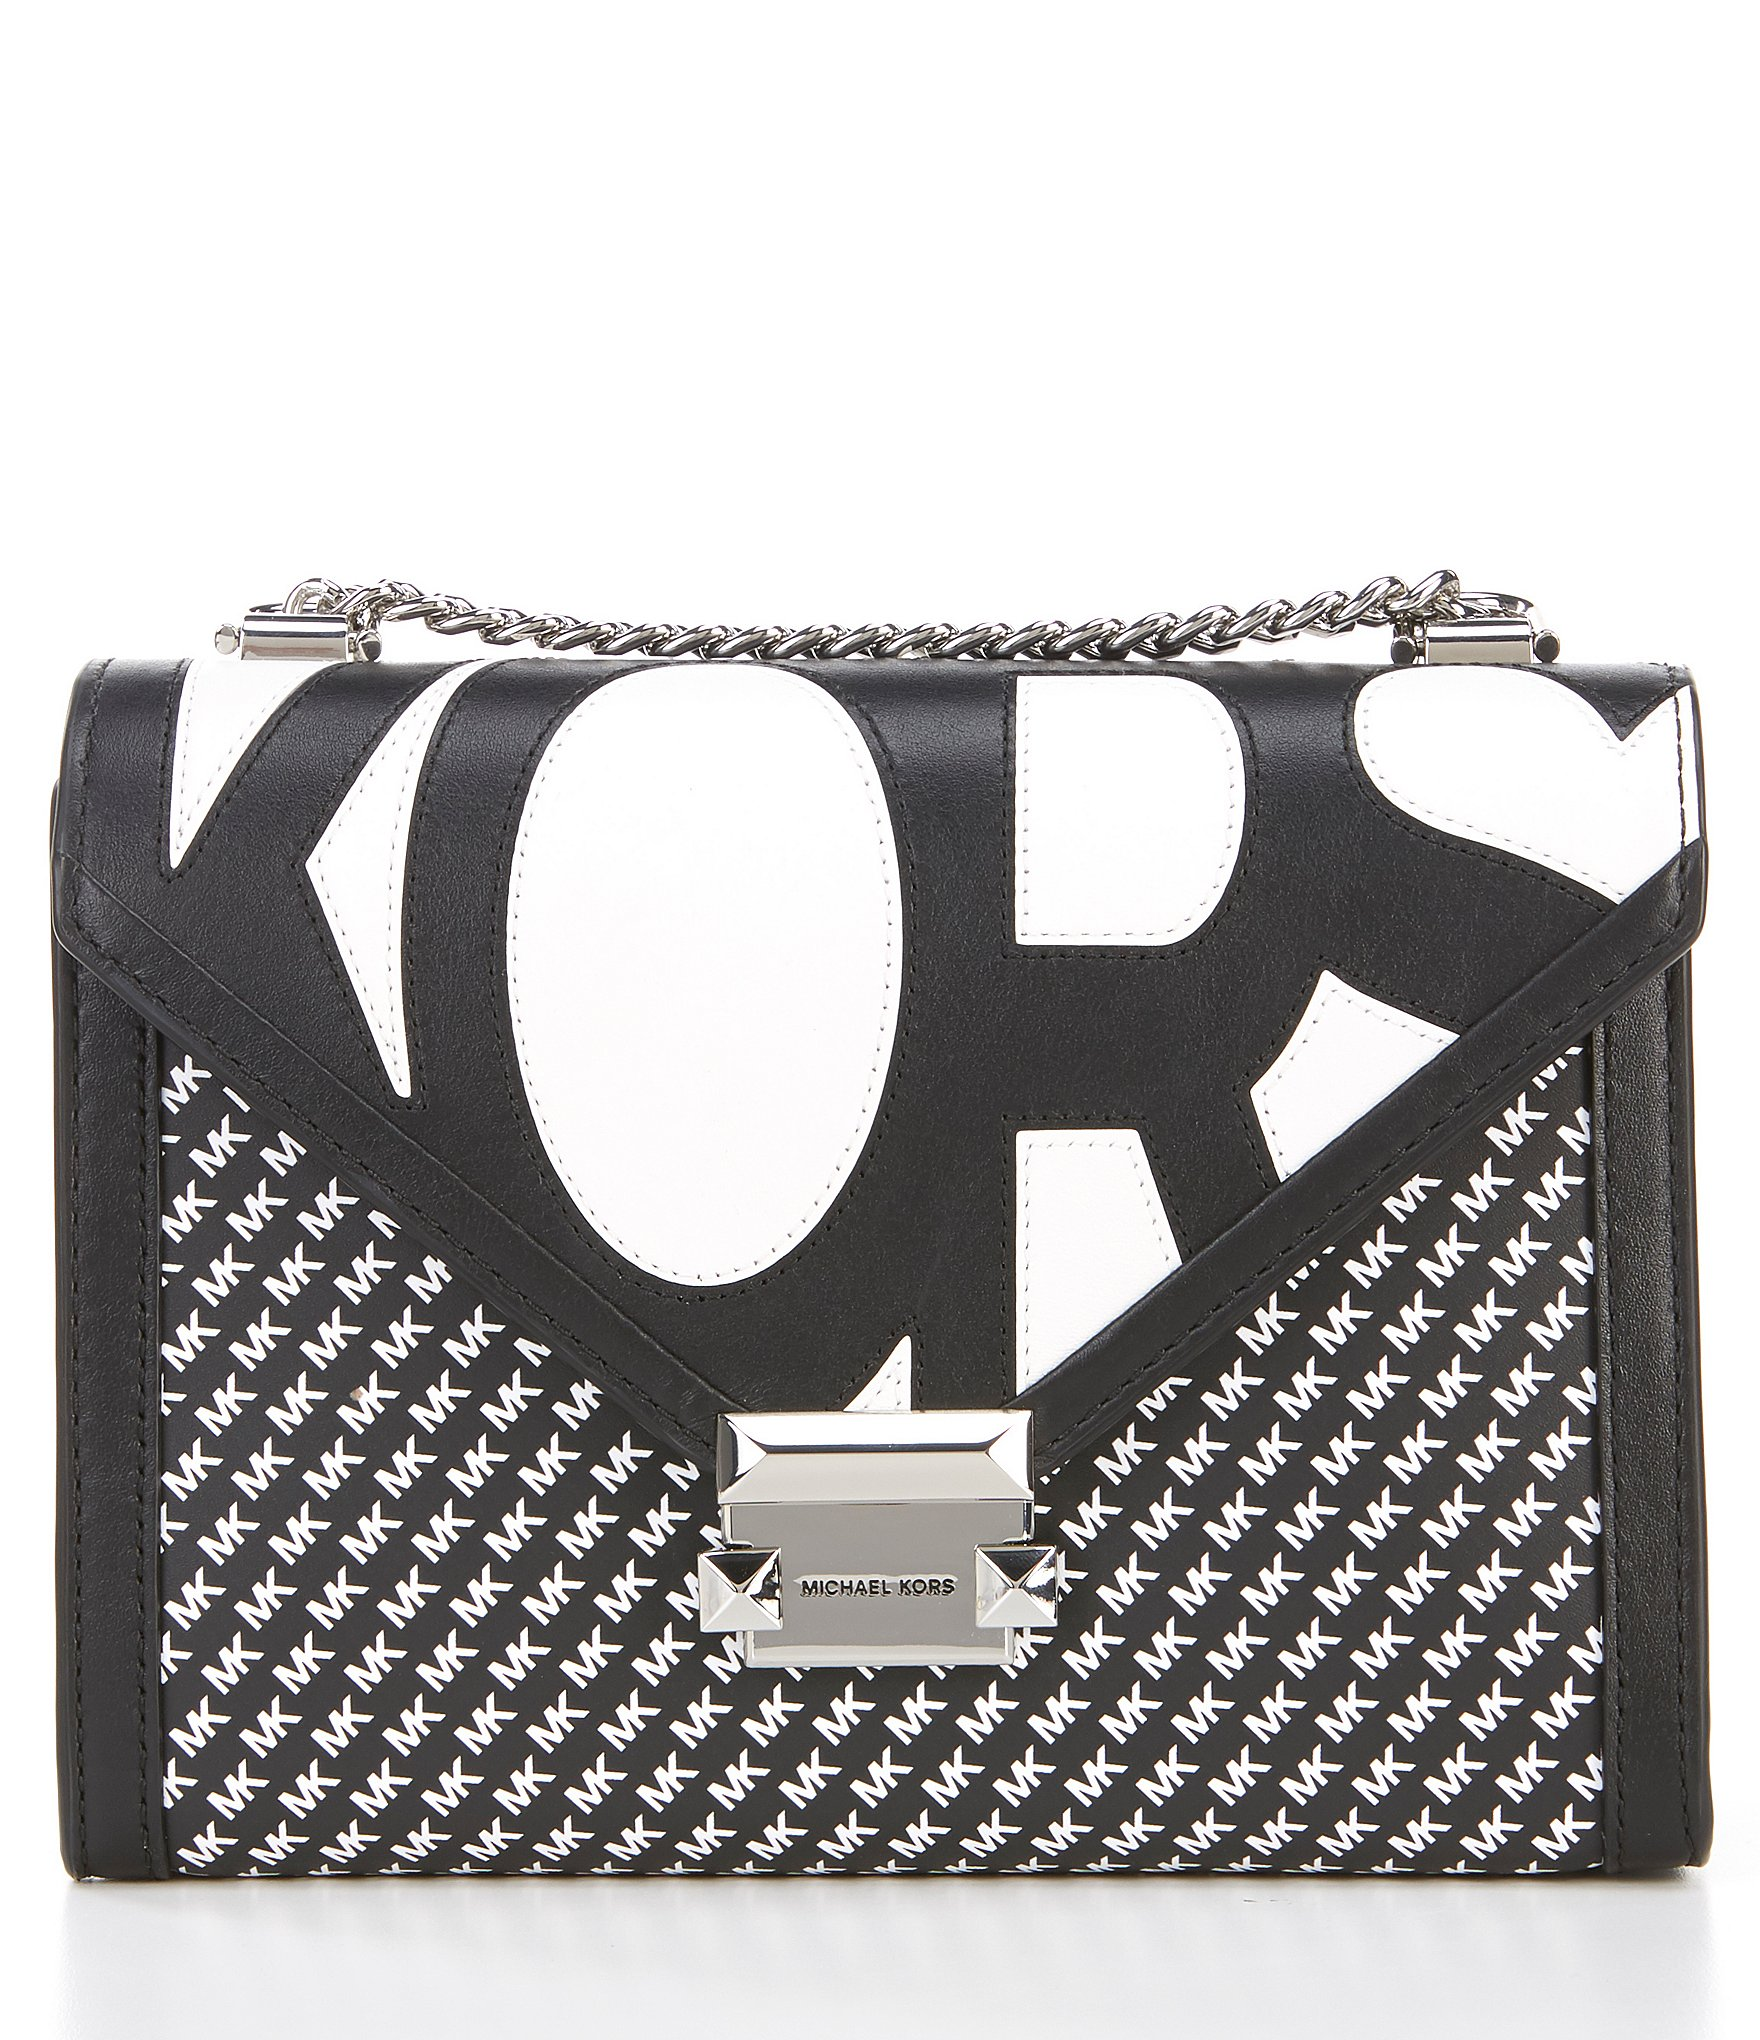 ee922979f3dc michael kors whitney: Handbags, Purses & Wallets | Dillard's